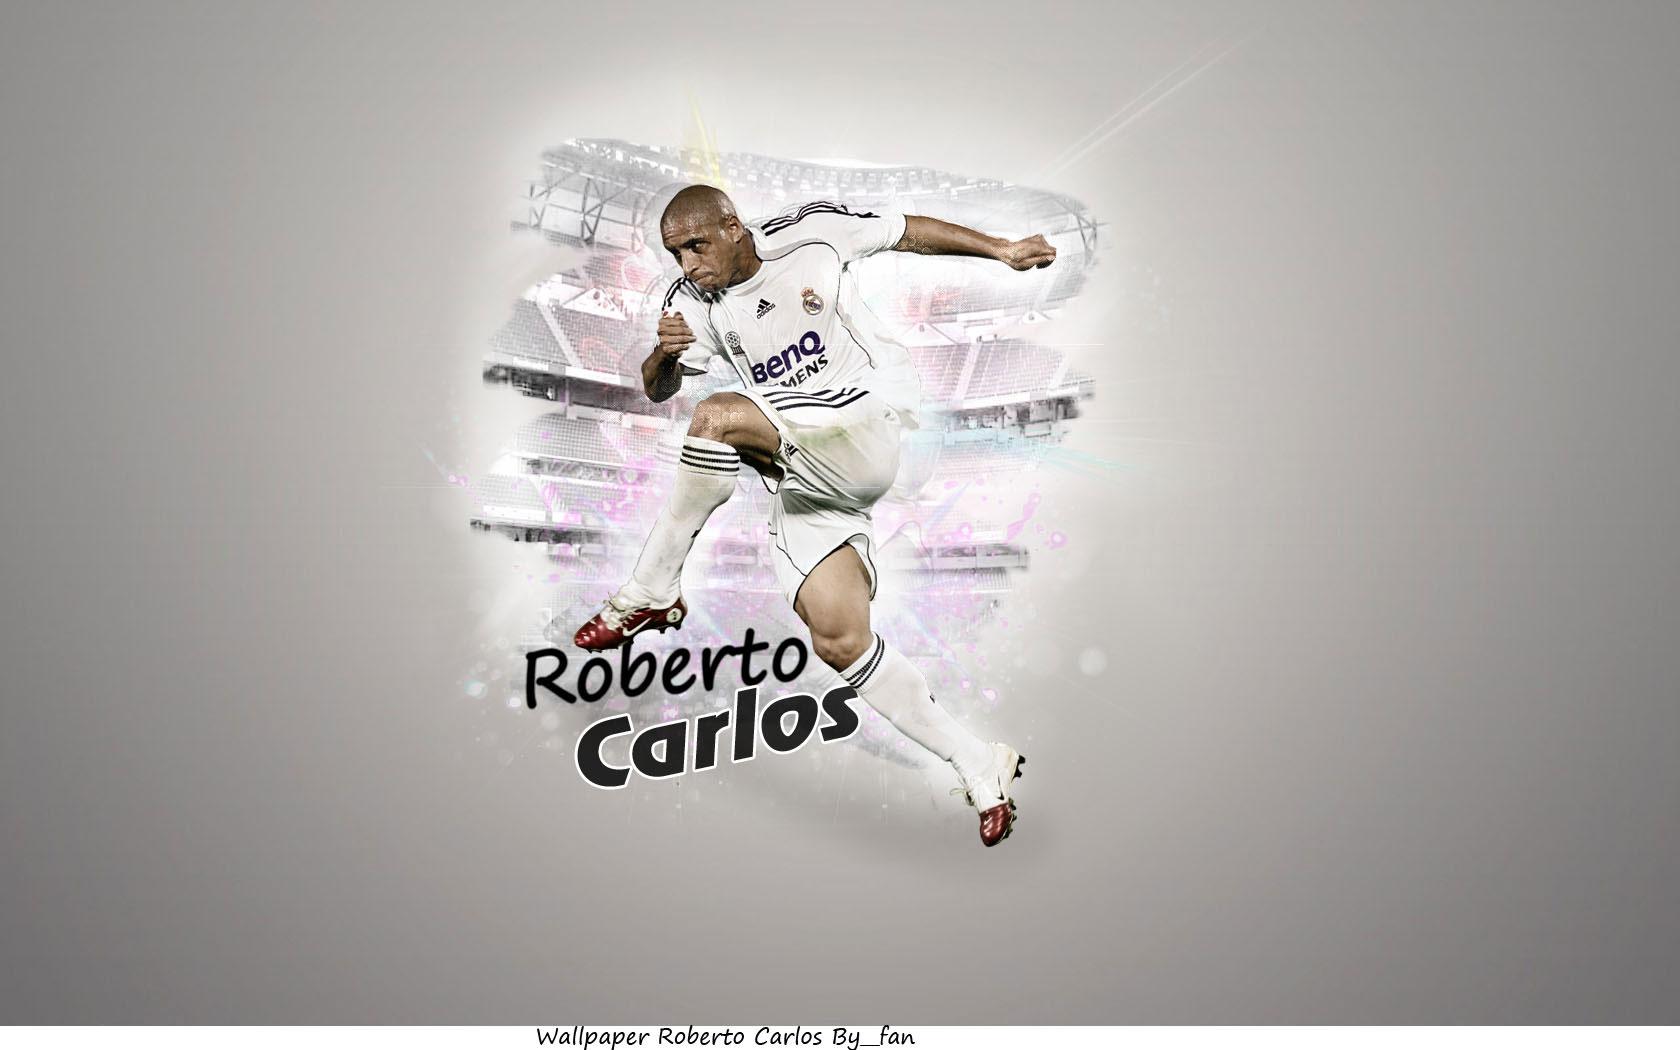 Roberto Carlos Football Wallpaper